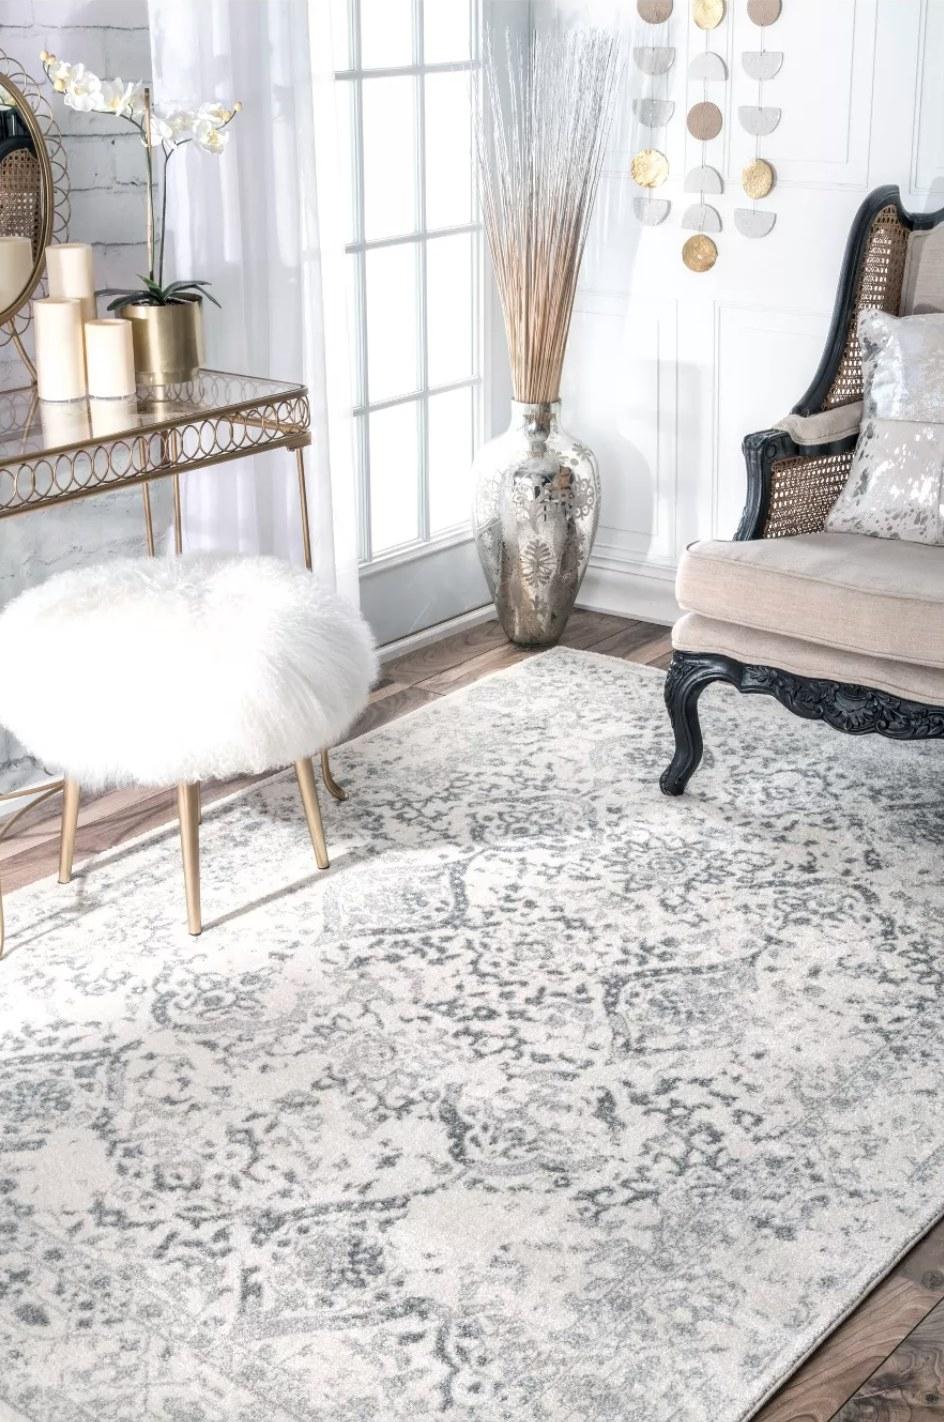 Vintage rug in living room.